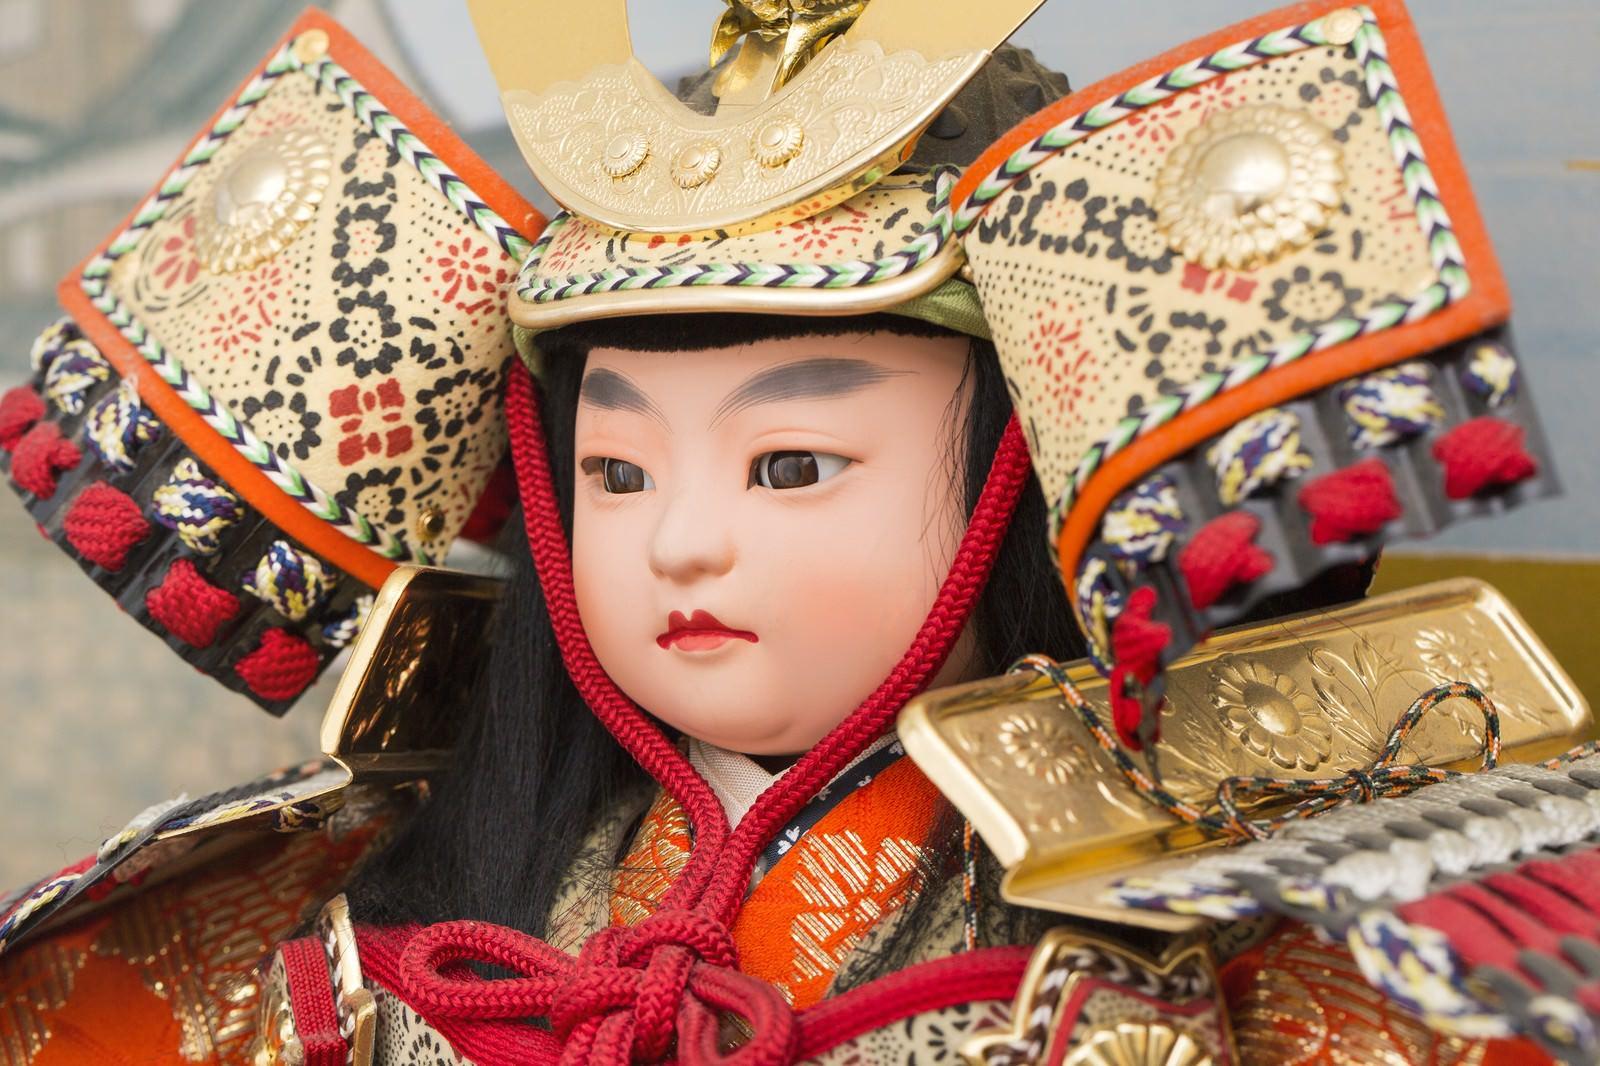 「五月人形(甲冑)」の写真